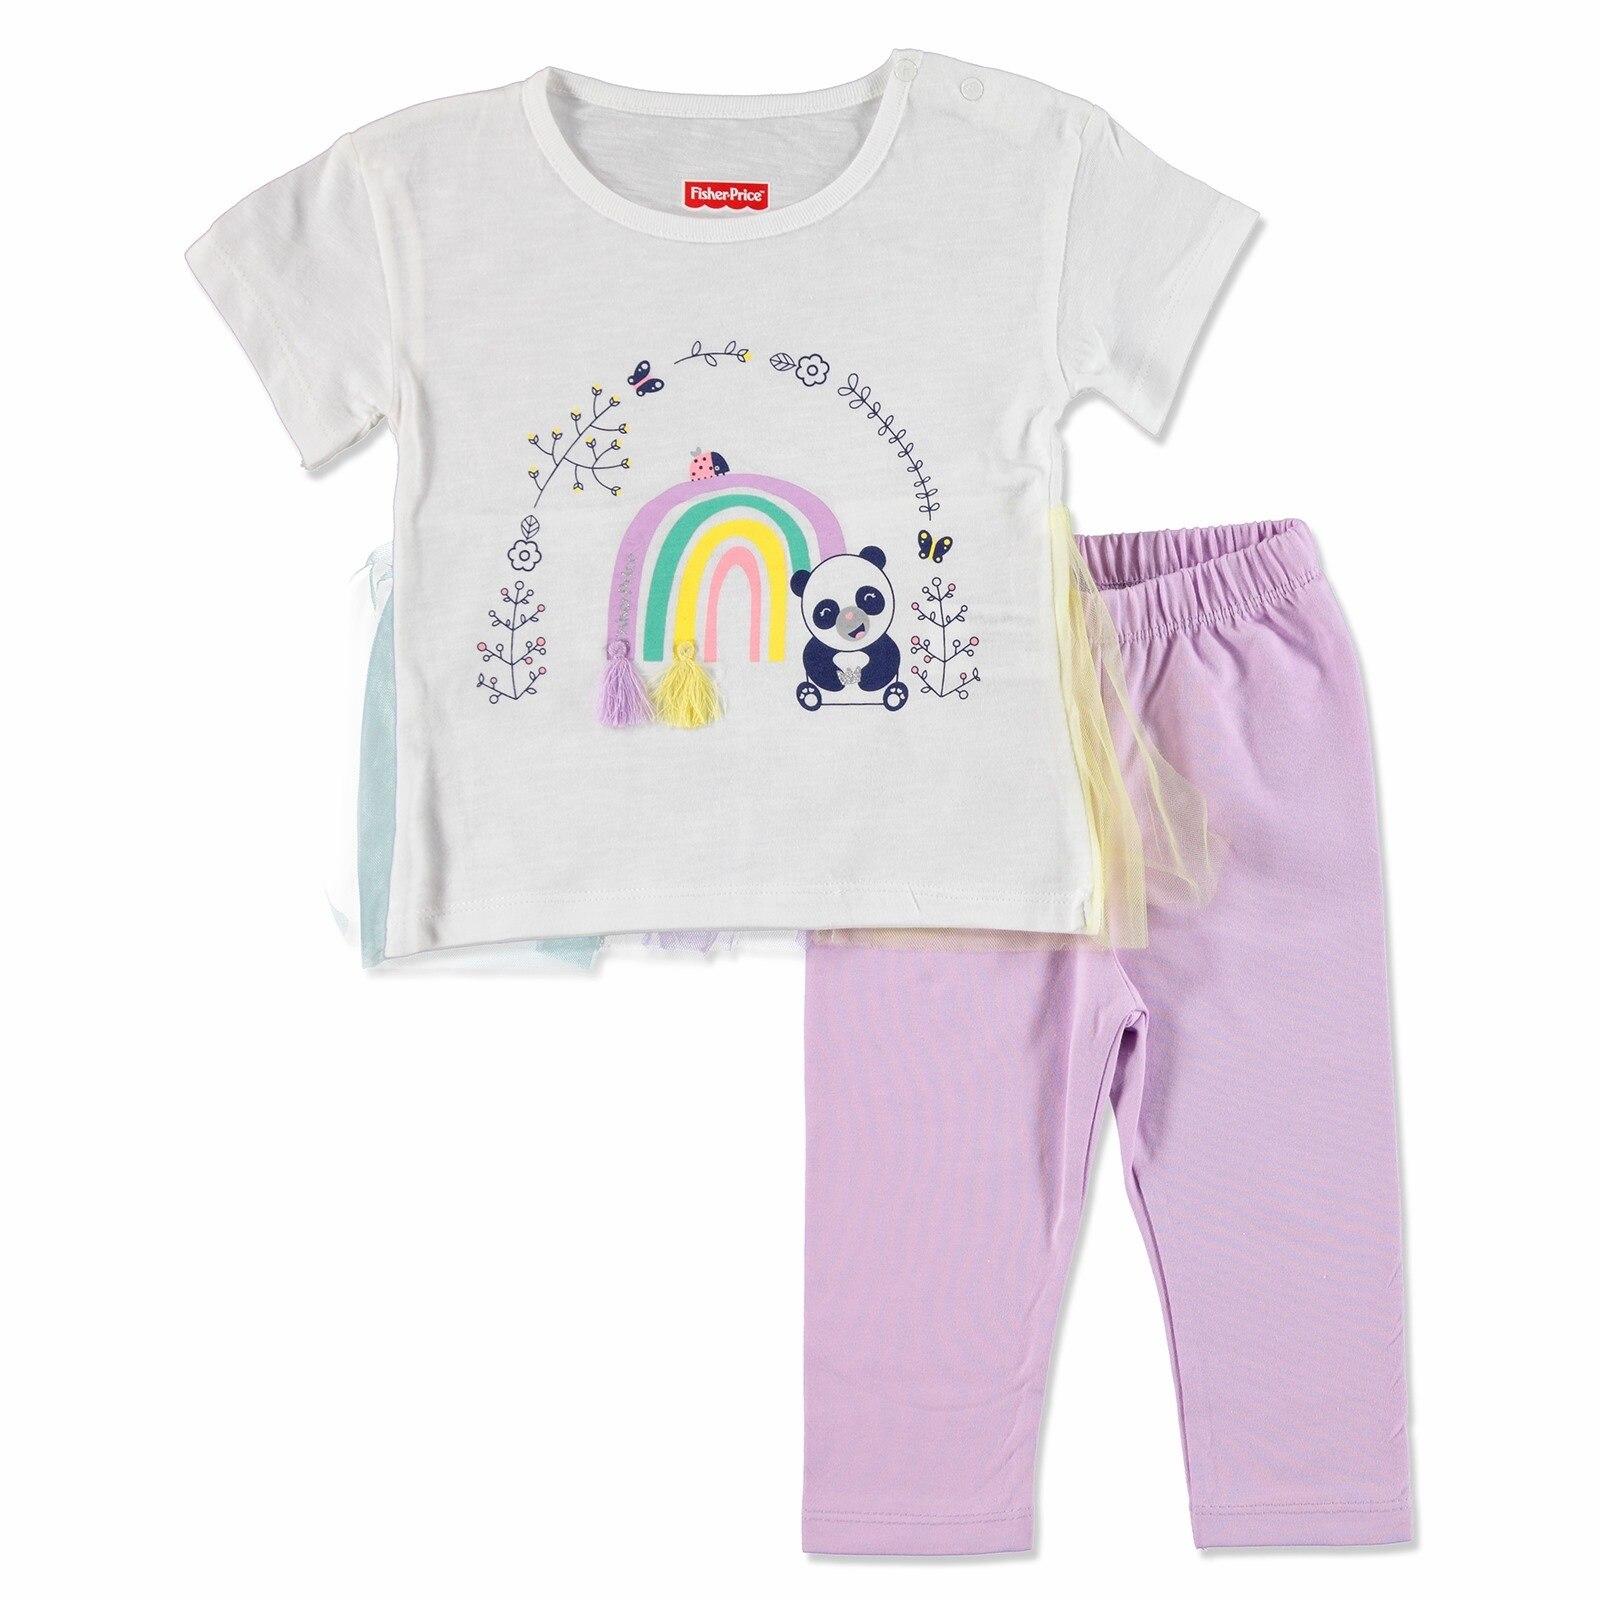 Ebebek Fisher Price Summer Baby Girl My Rainbow T-shirt Leggings Set